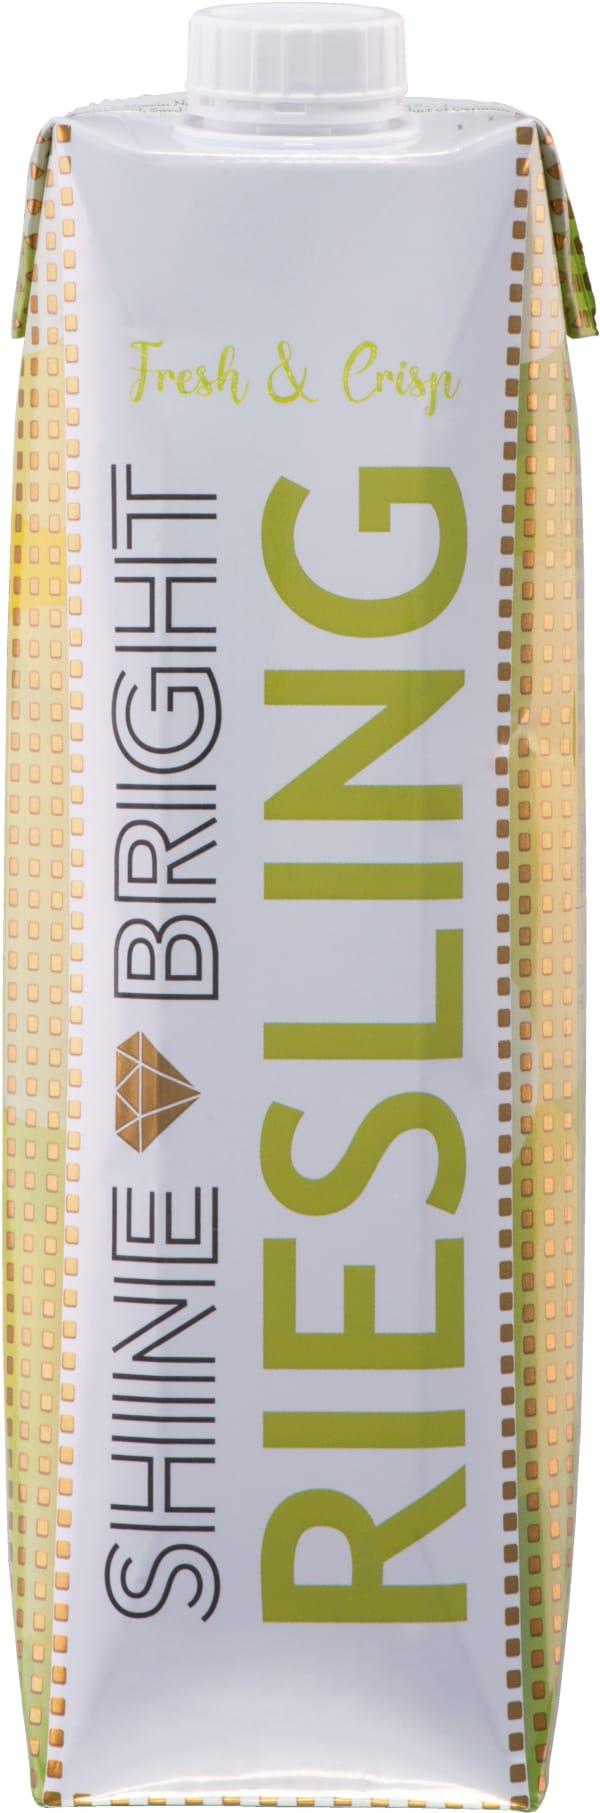 Shine Bright 2018 carton package